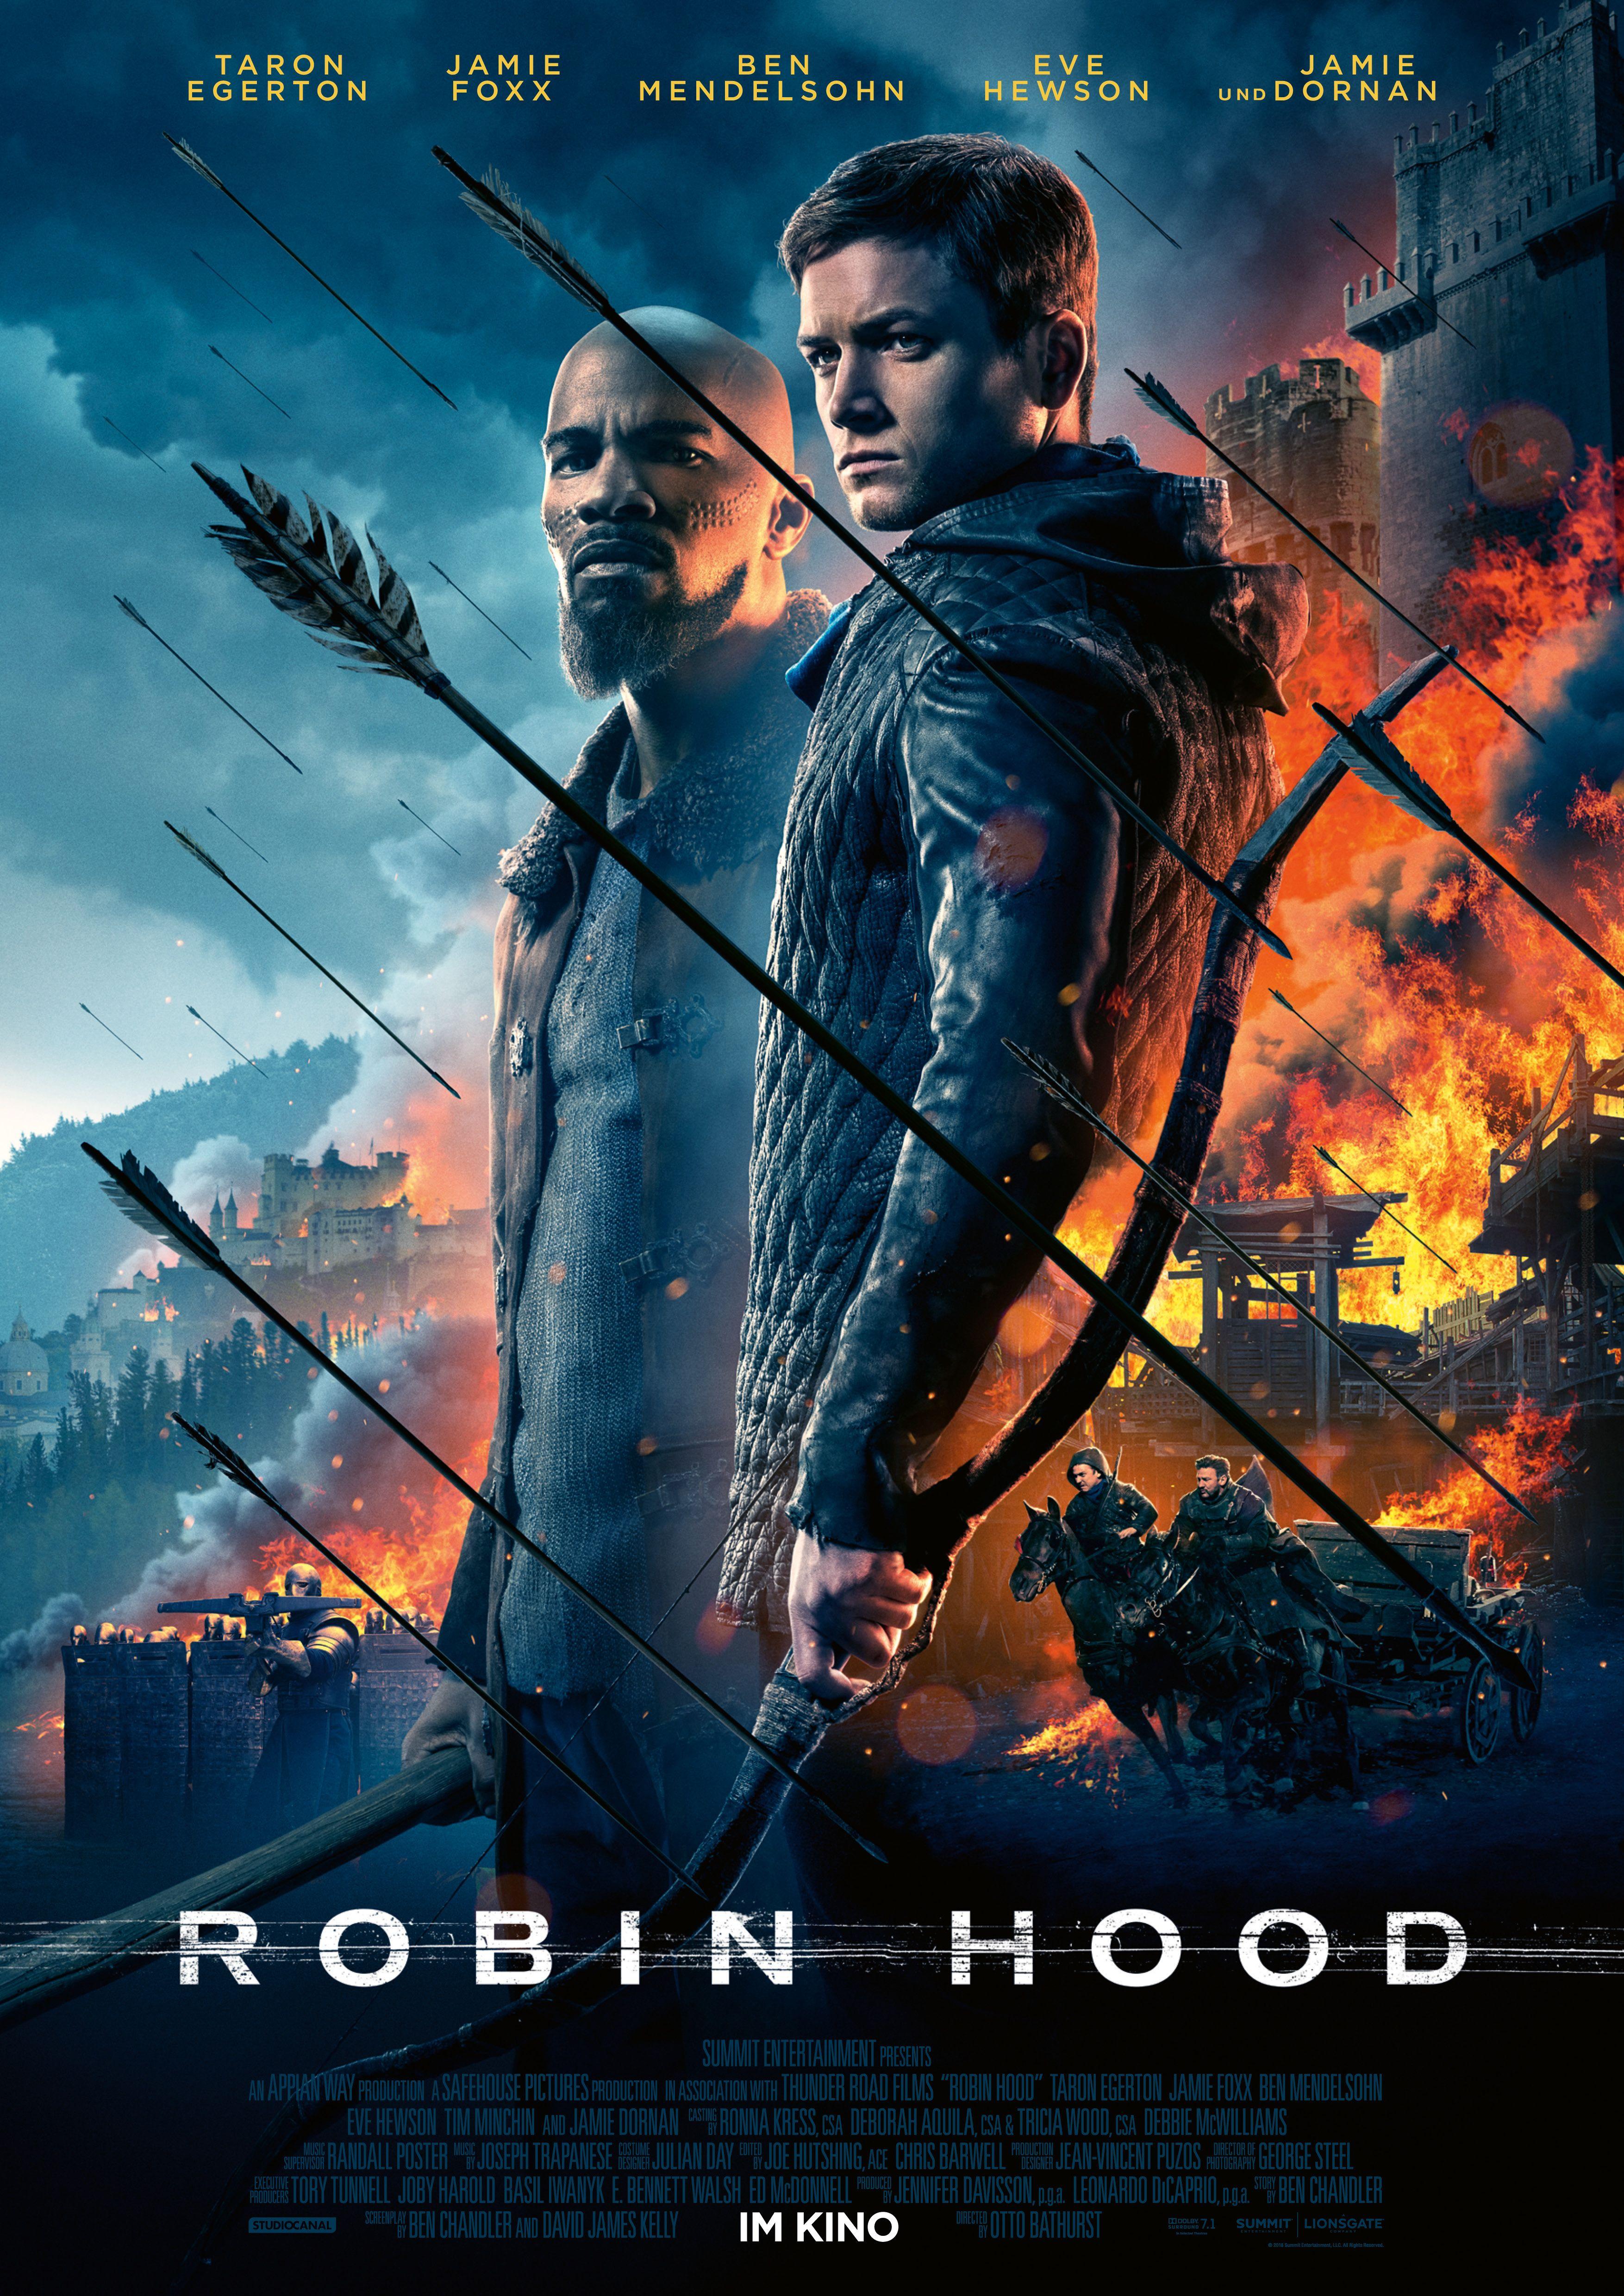 robin hood film # 1